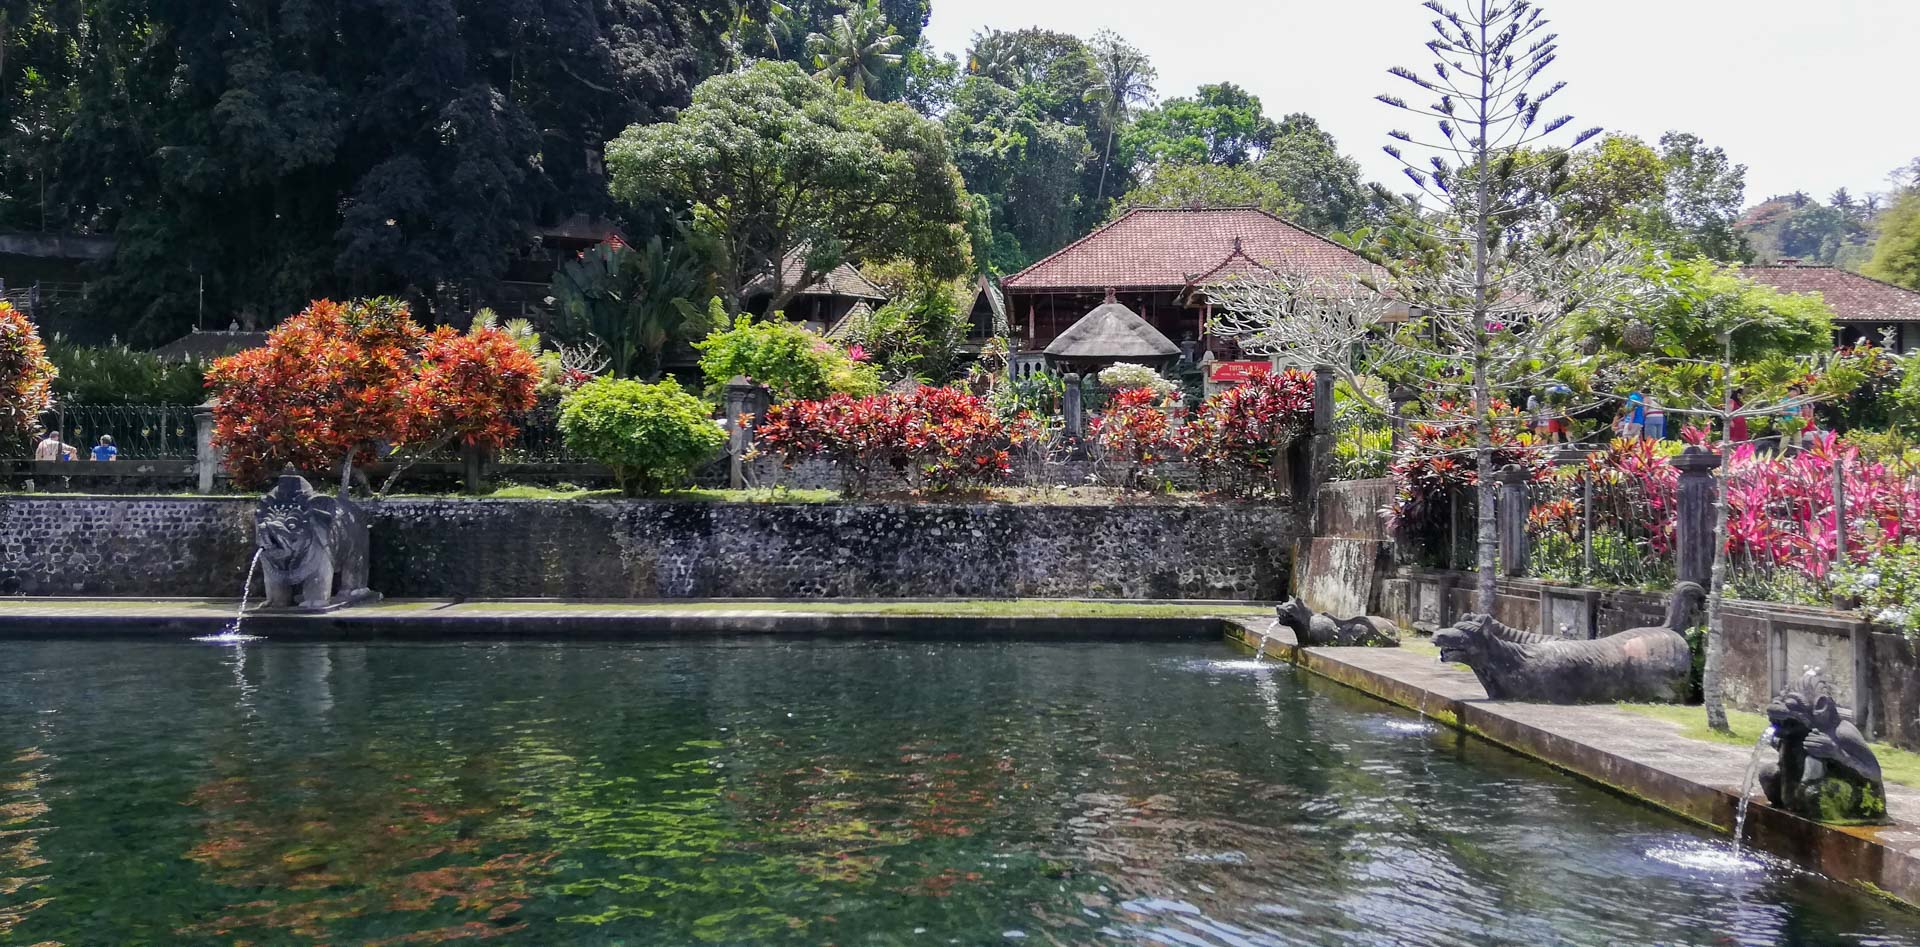 Palacio de agua, Tirta Gangga, Bali, Indonesia